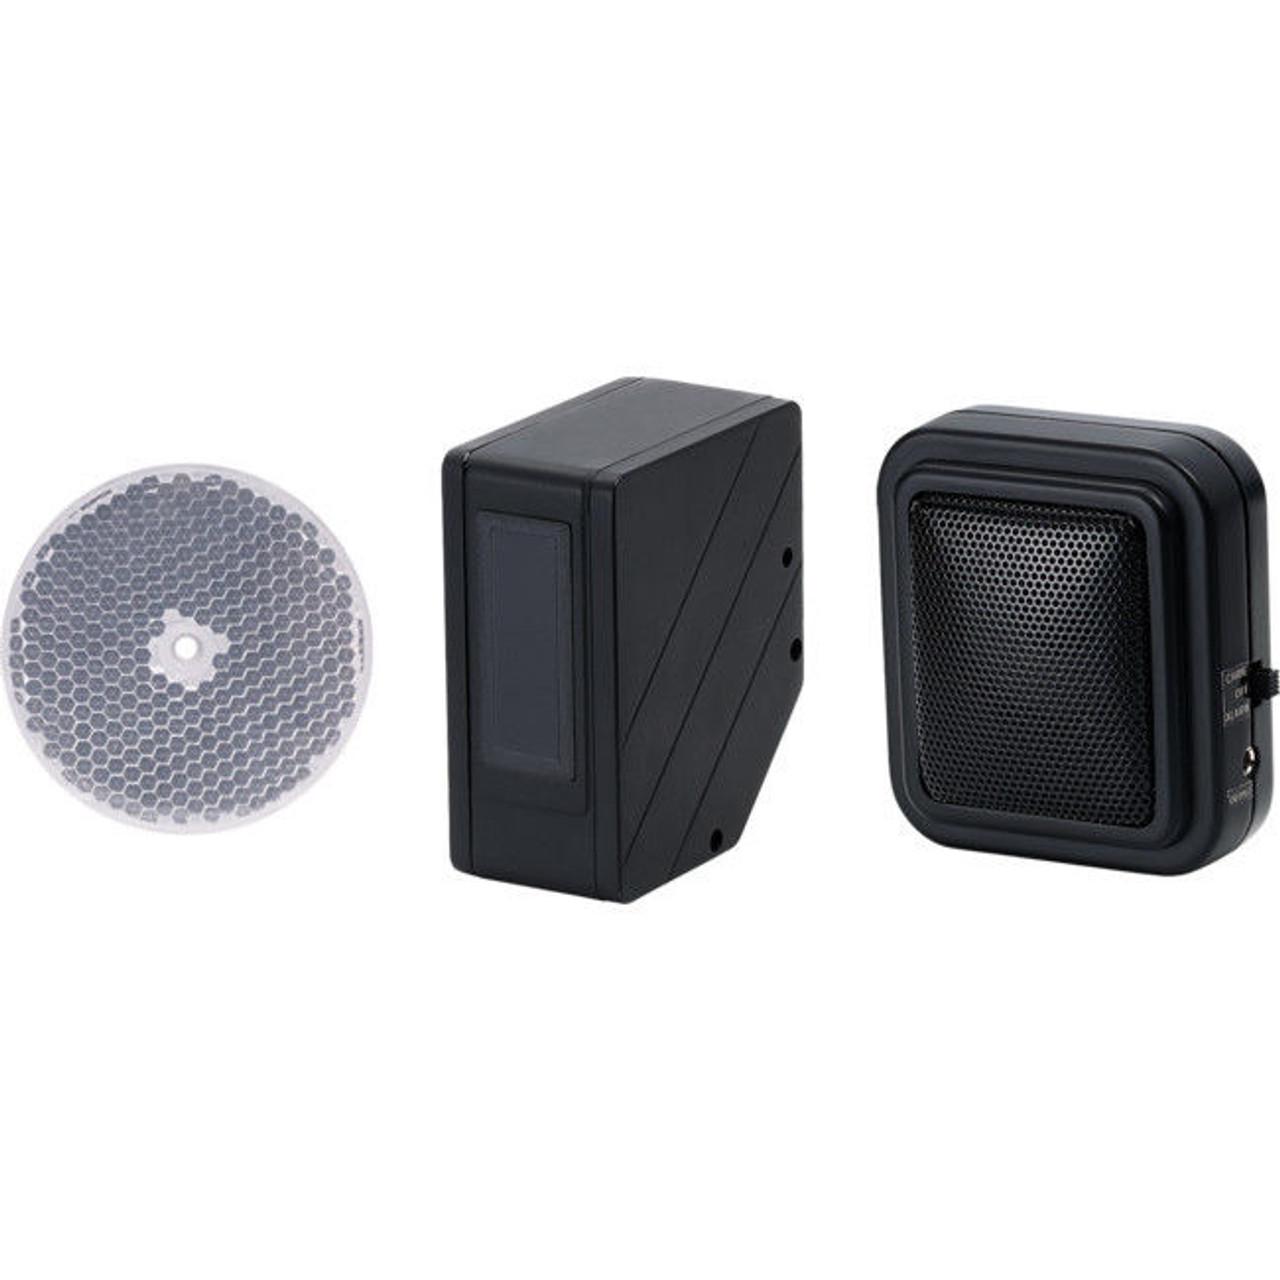 DOSS DEA7WL2 Compact Wireless Door/Beam Entry Alarm System - RRP $149.00